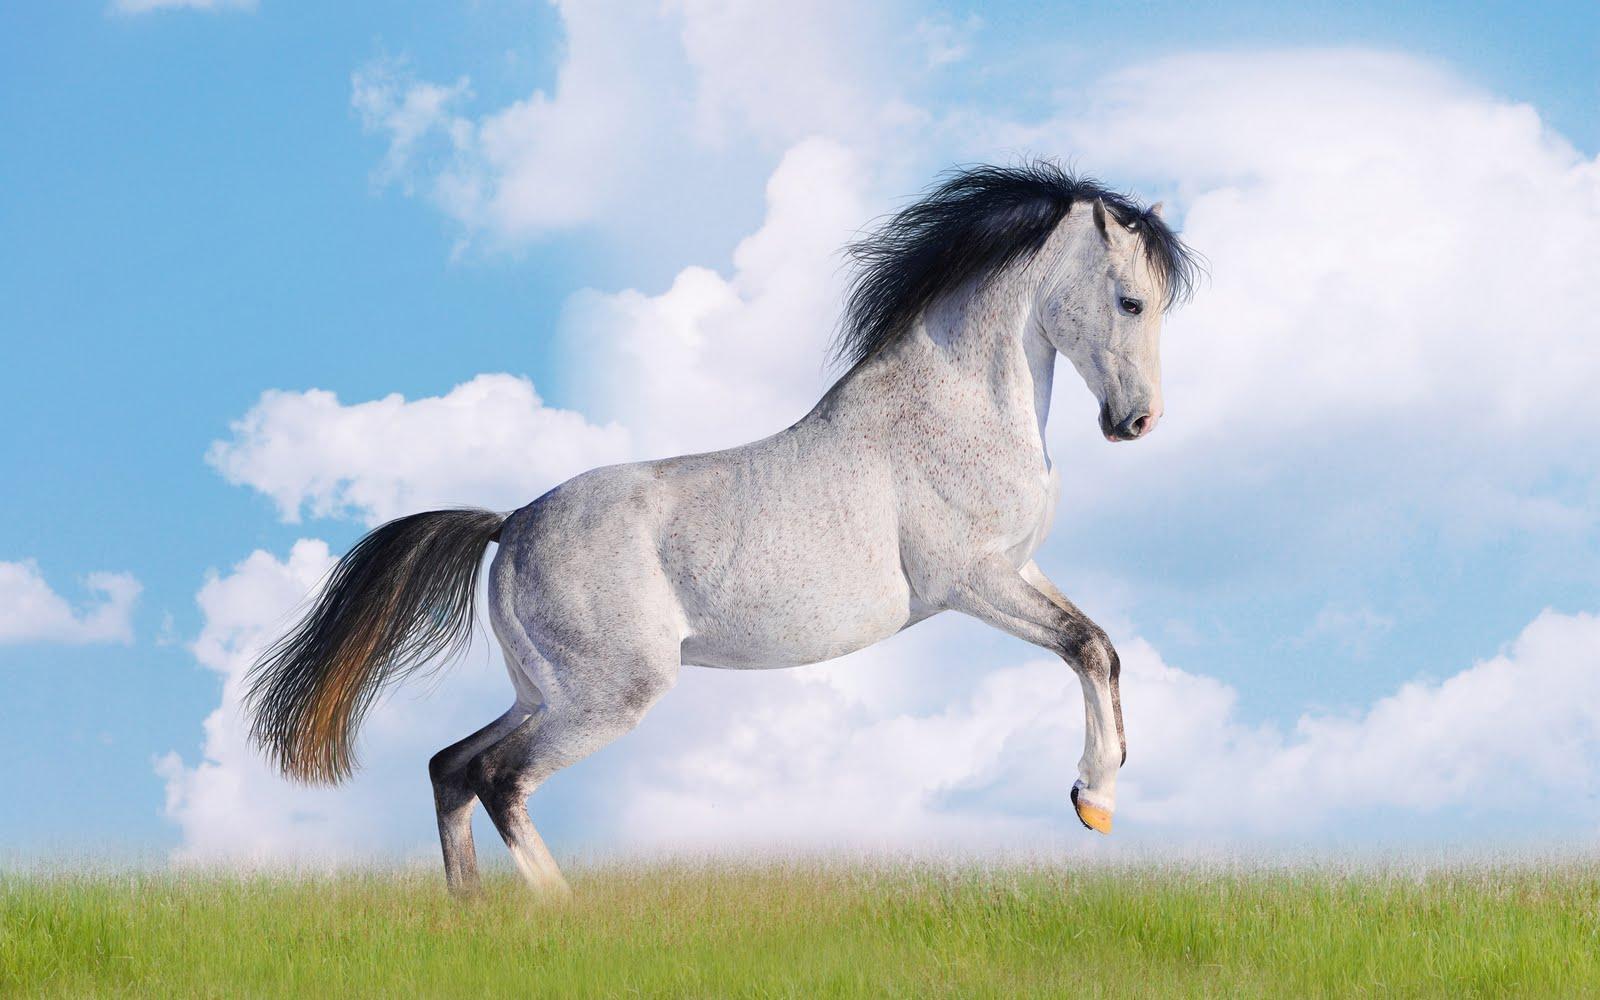 Banco de im genes fotograf as de caballos vi equinos de for Fotos 2048x1152